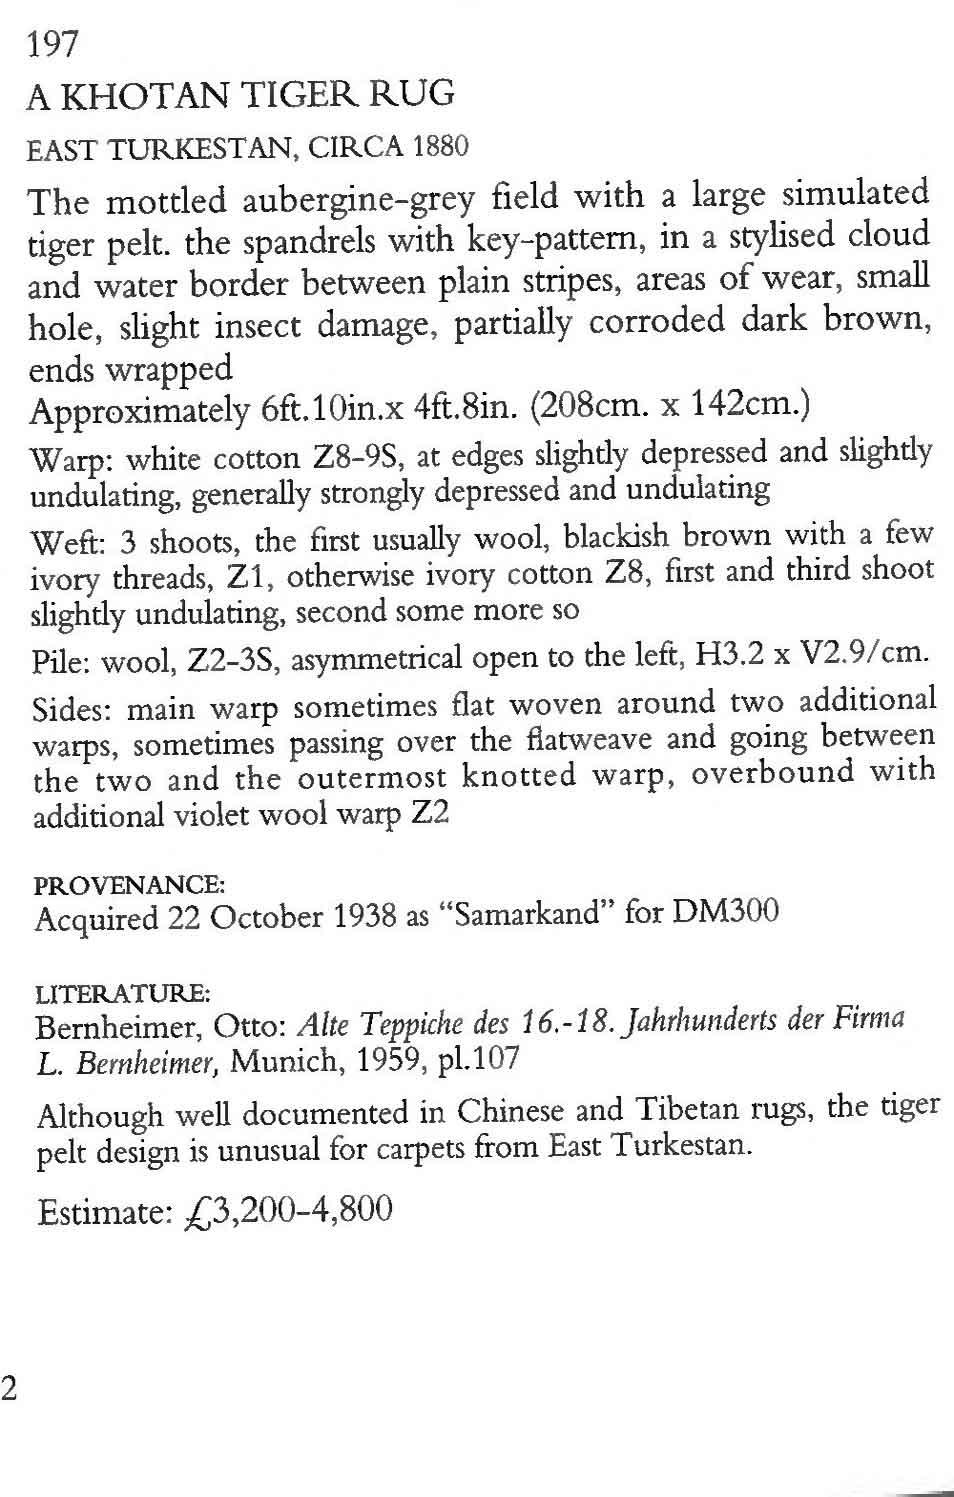 Description of 'A Khotan Tiger Rug' - Lot 197 - Christie's Bernheimer Auction   Please excuse the image quality.   Image courtesy of Christie's